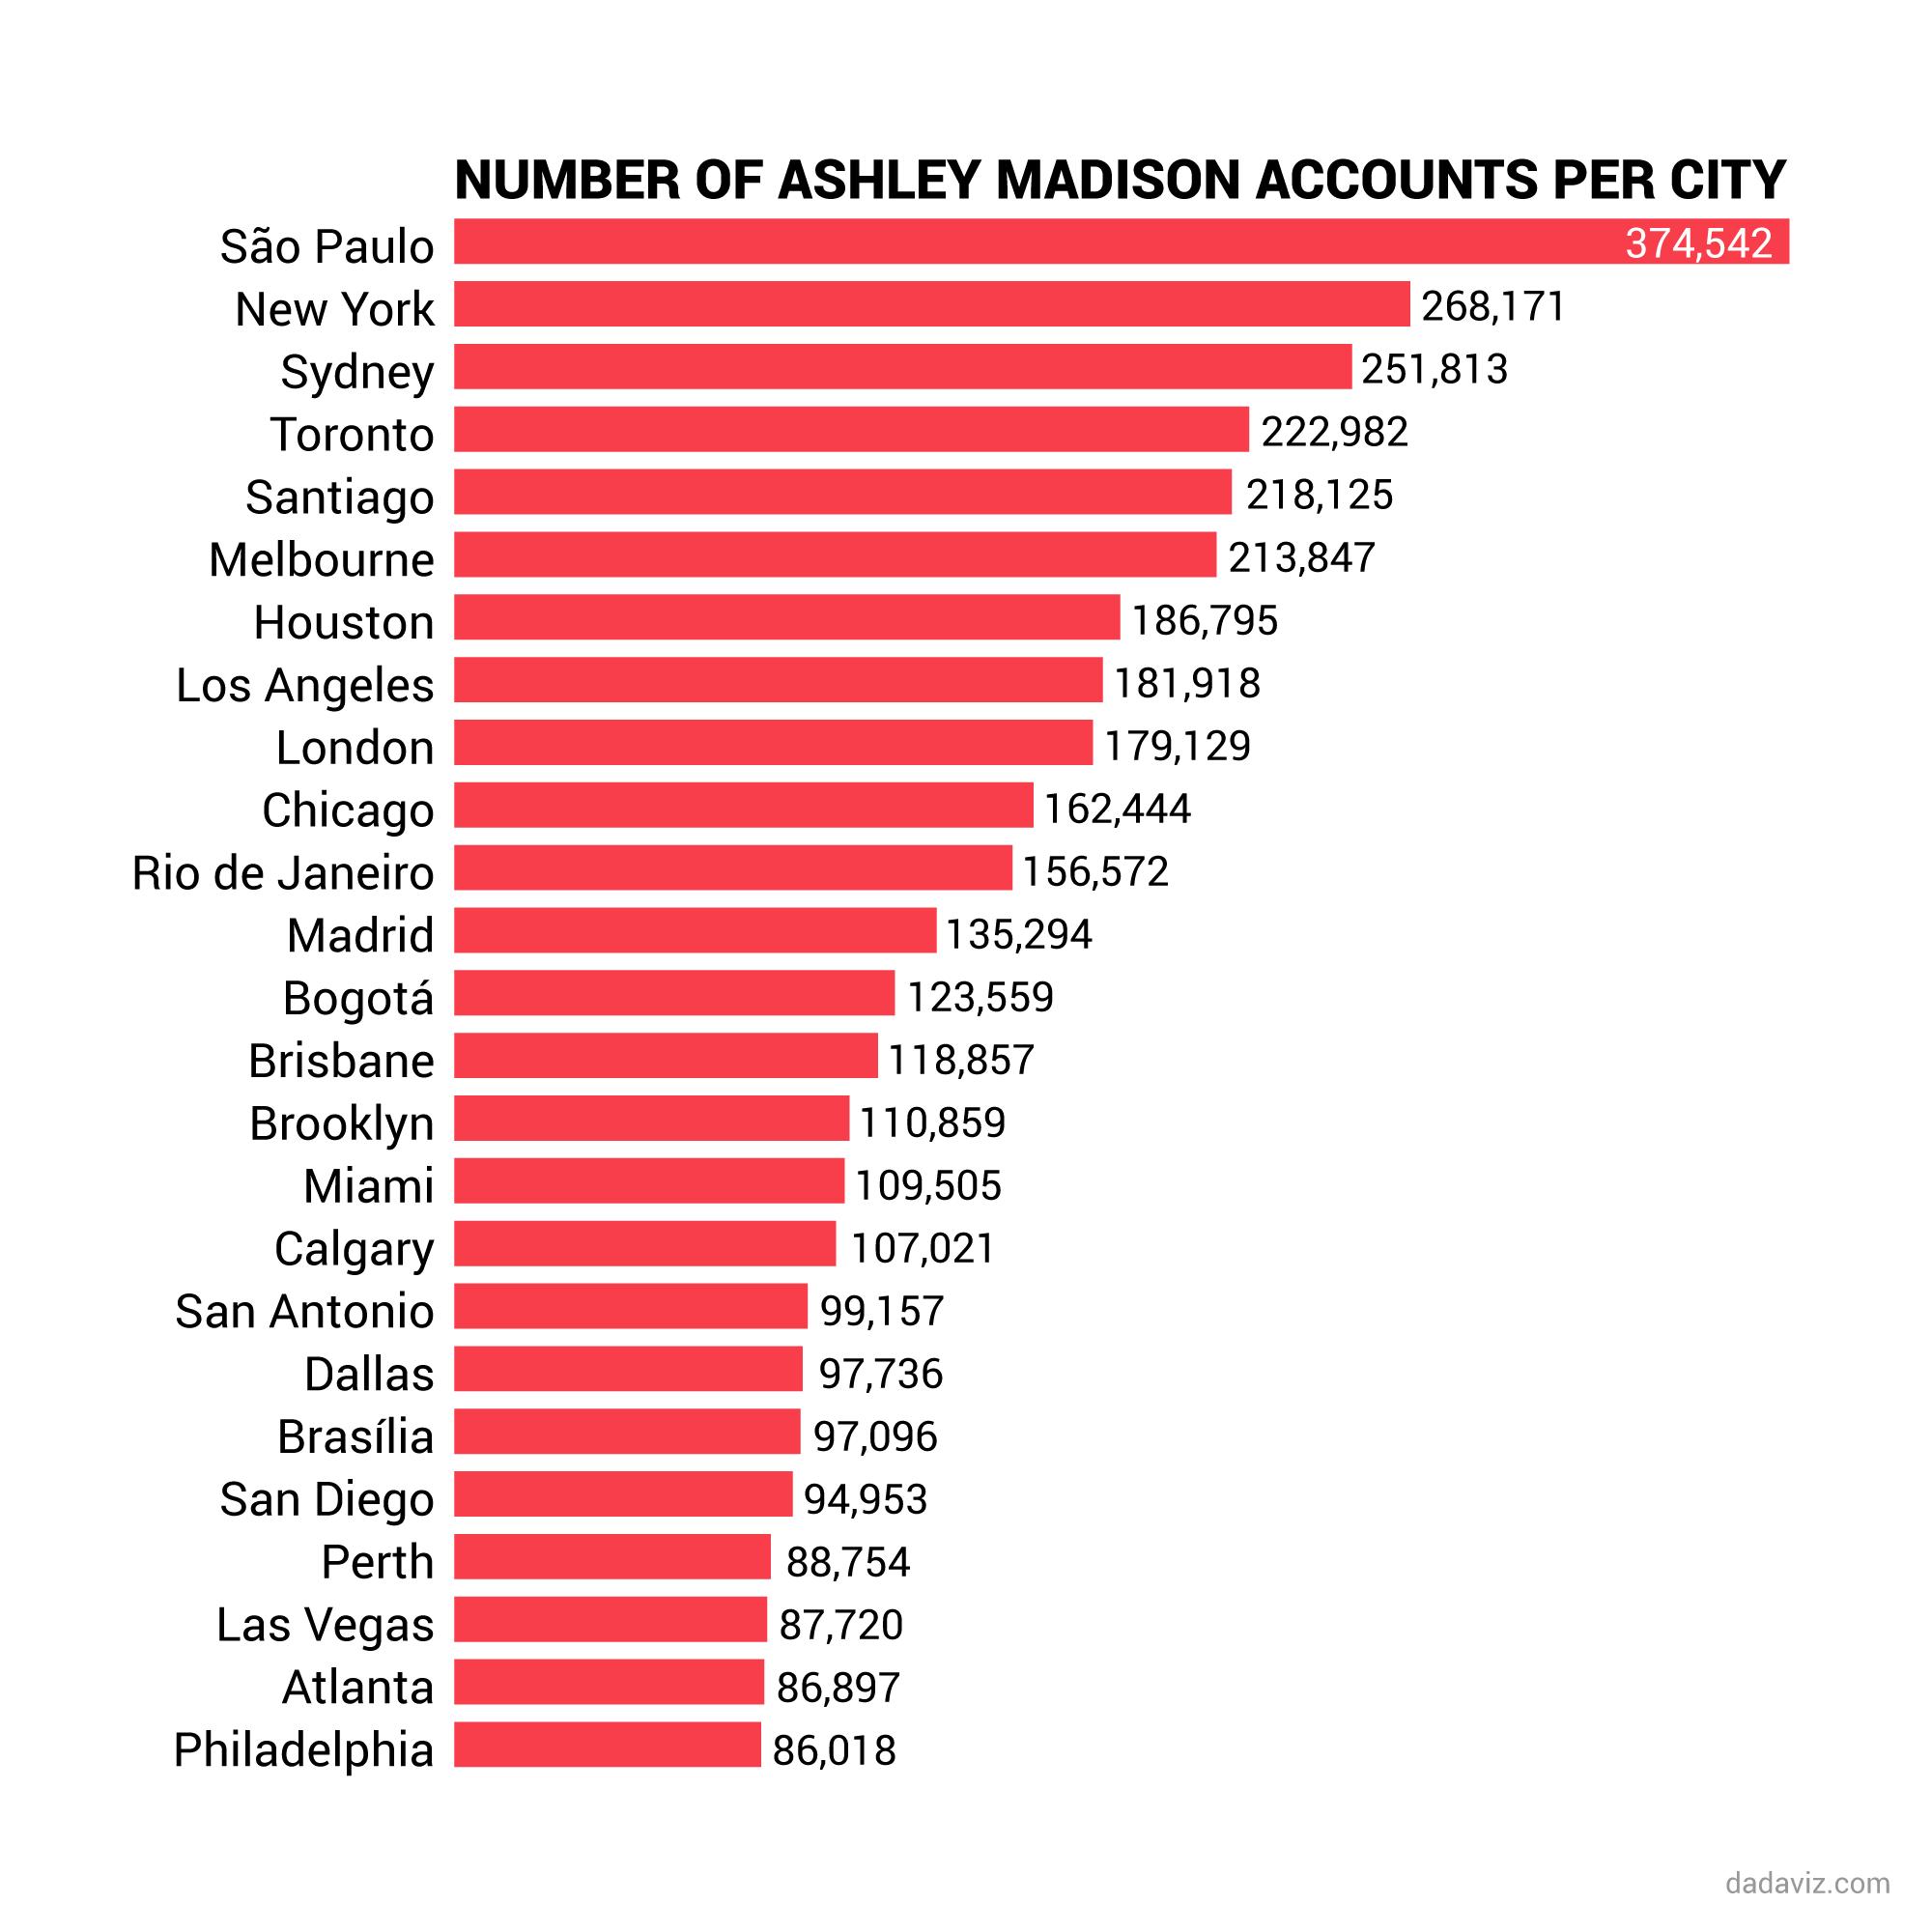 Ashley Madison clients